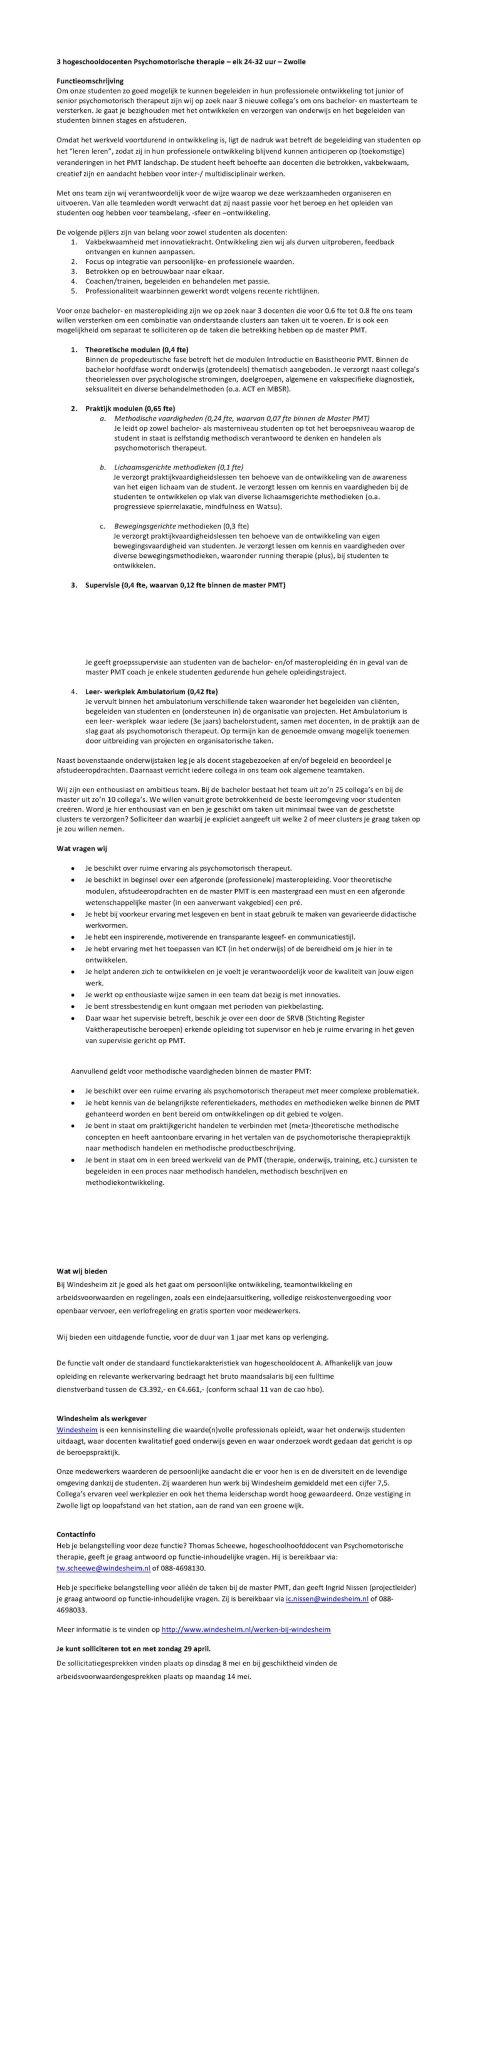 #vacature #docent #opleidingPMT 3x 24-32 uur p/w Zwolle #windesheim https://t.co/WrRpT92bim